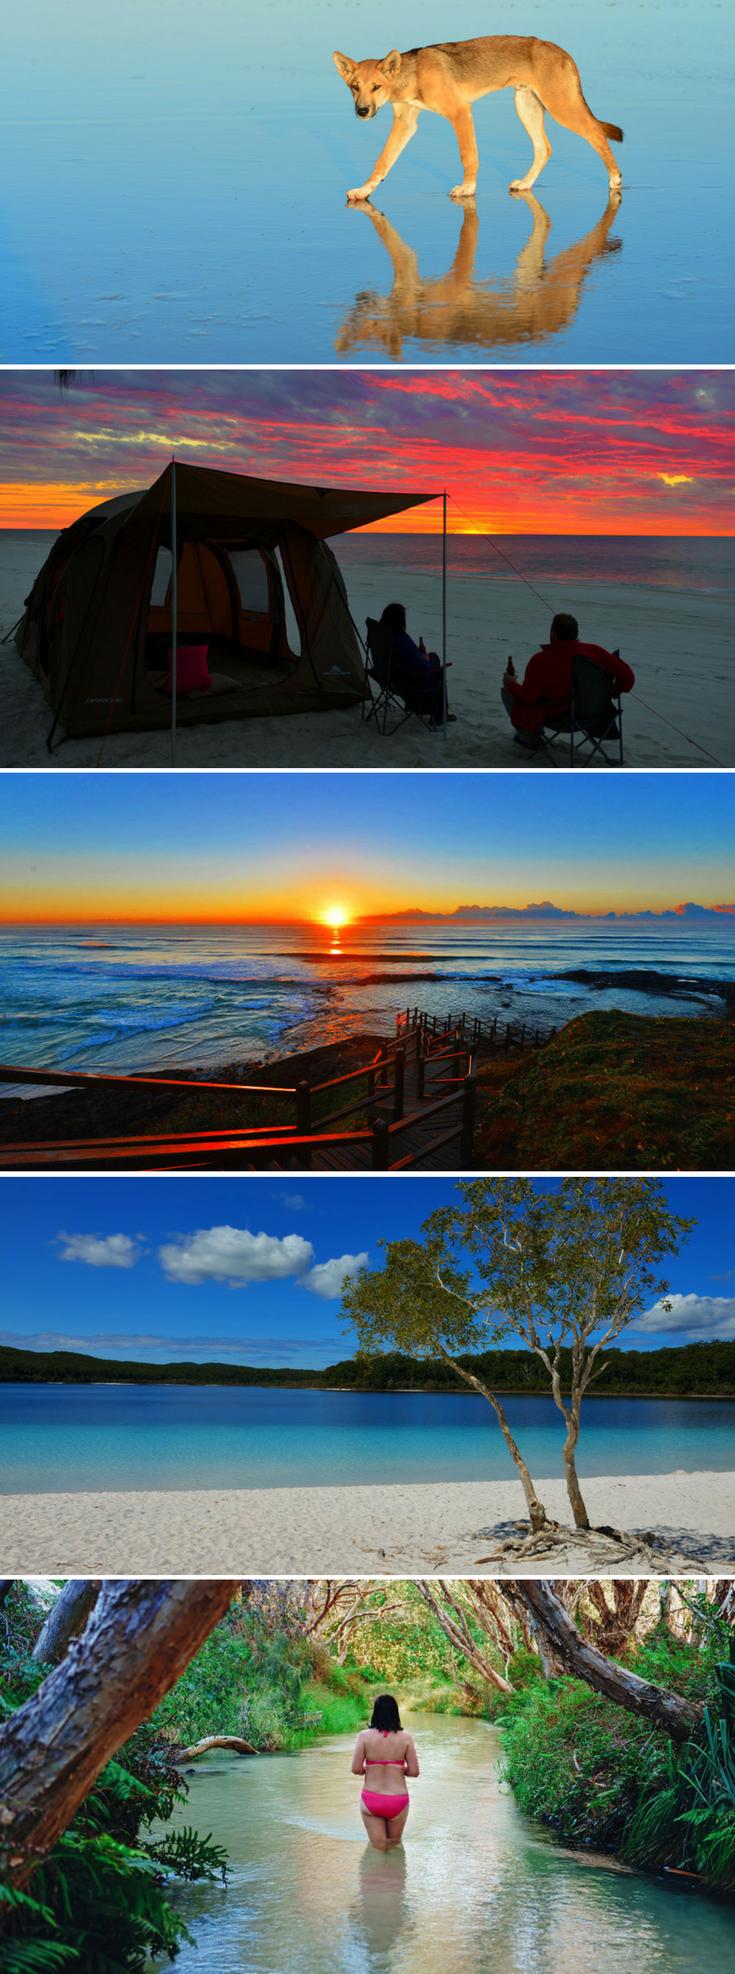 Fraser Island Camping Tips Fraser island australia